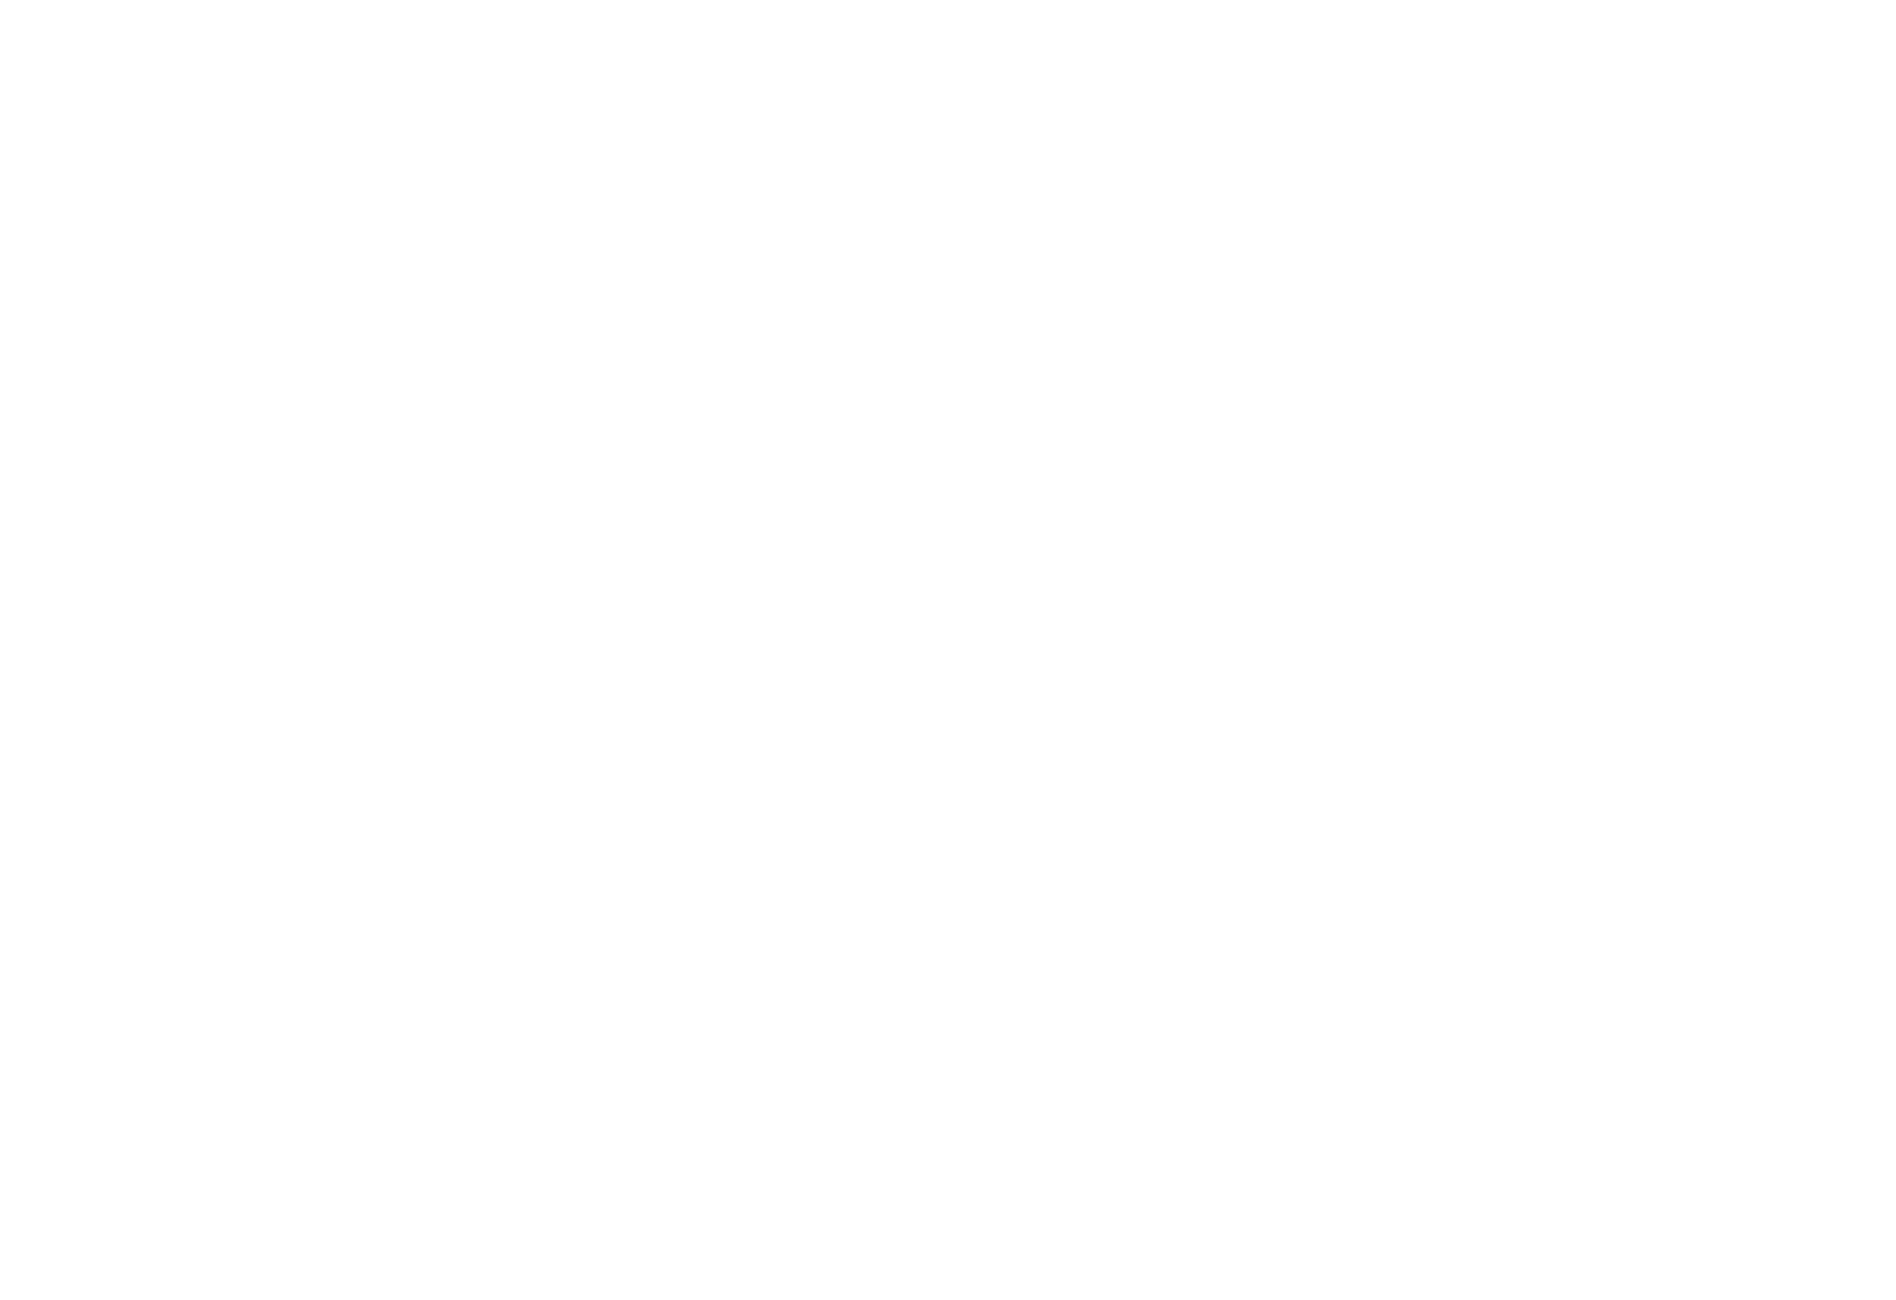 mbf-media-farbe